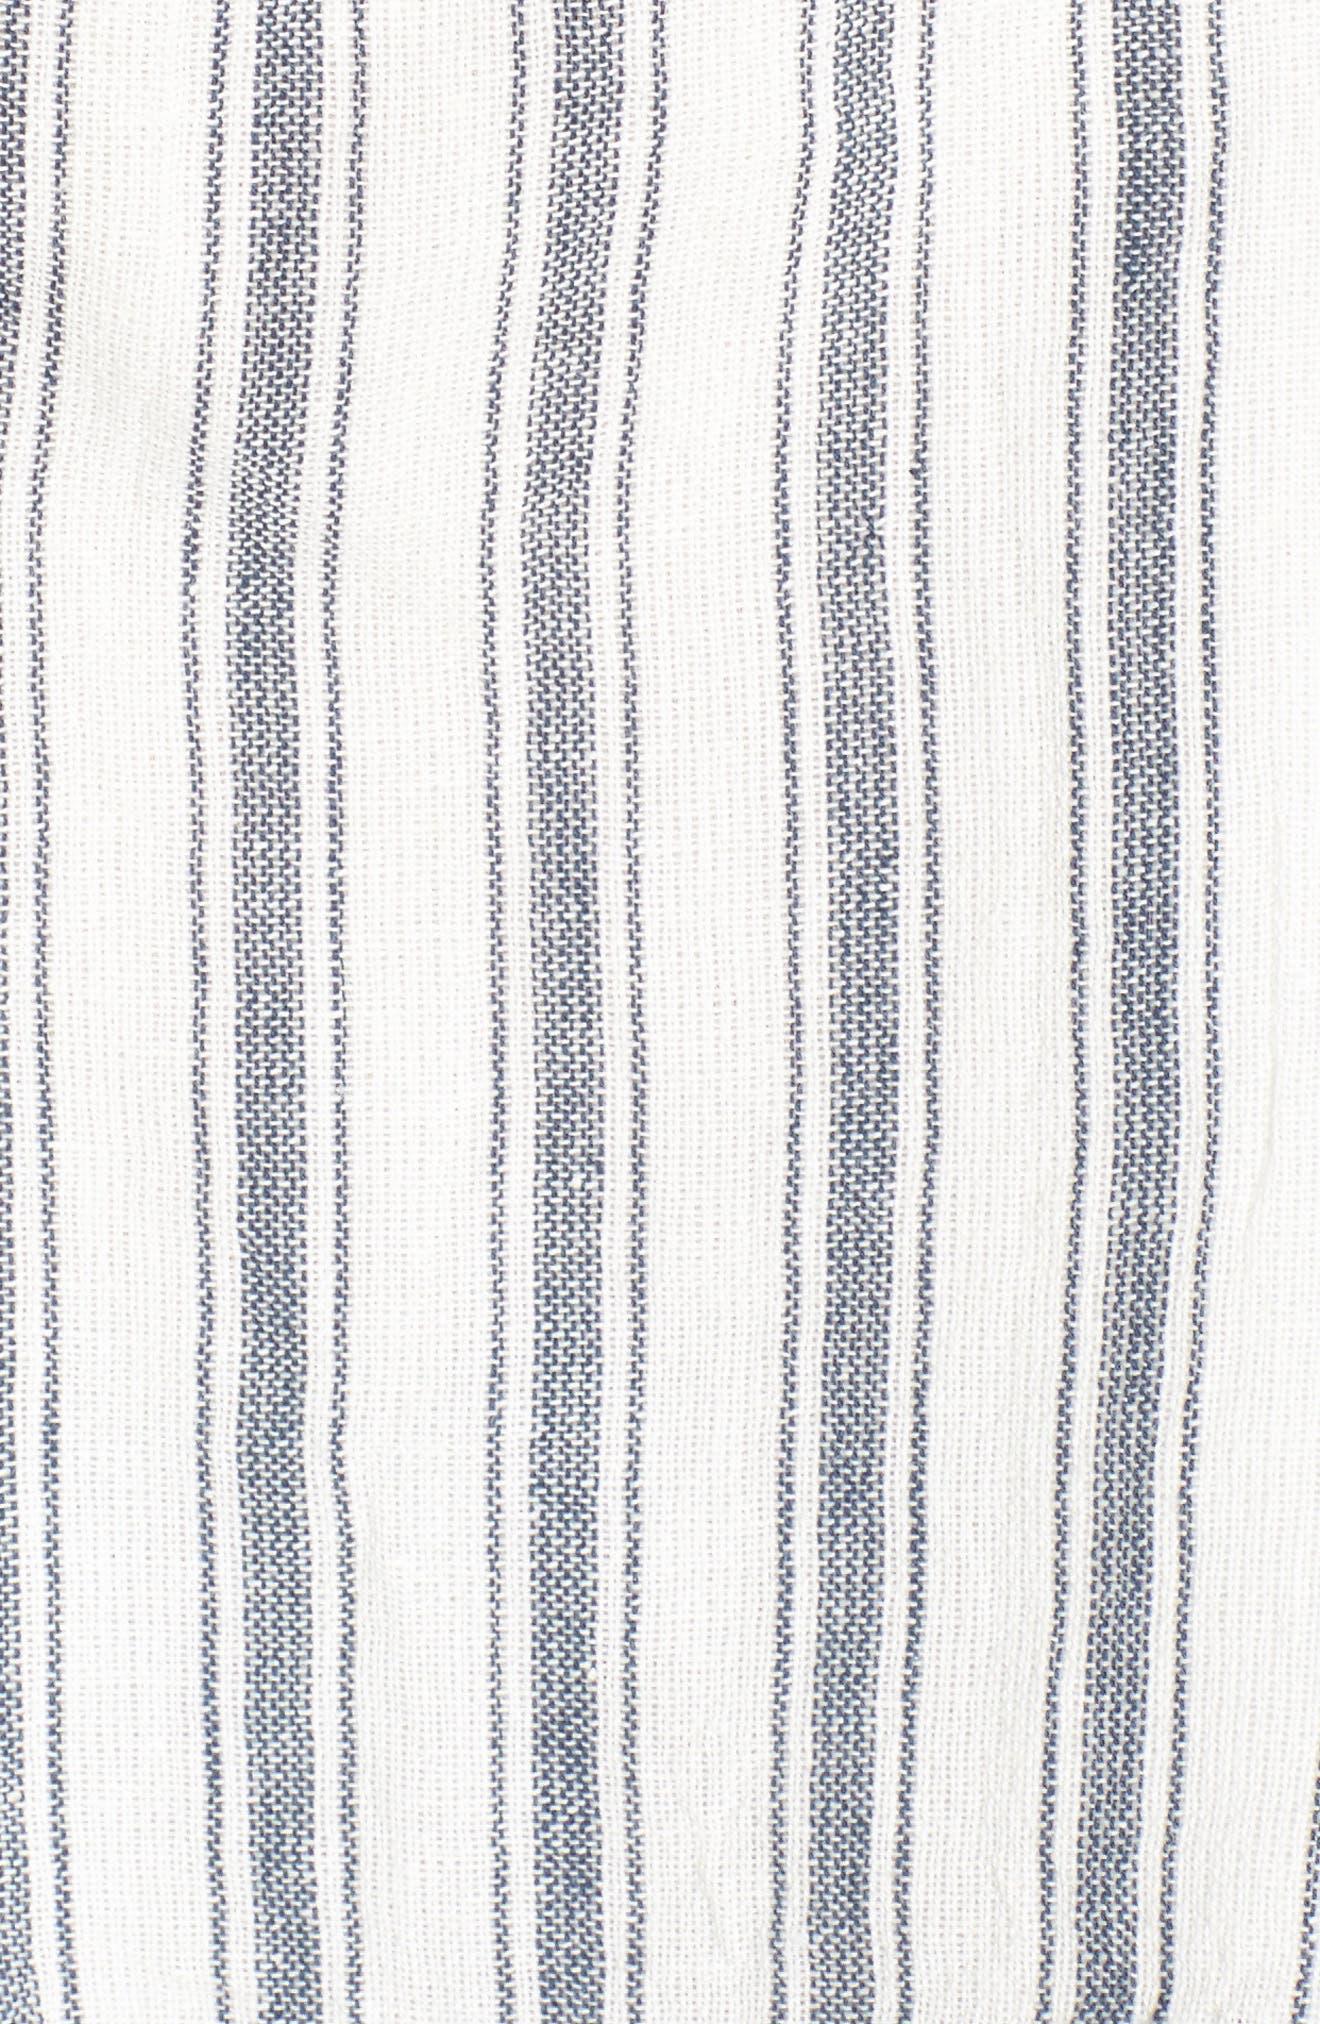 Darby Stripe Halter Top,                             Alternate thumbnail 5, color,                             900